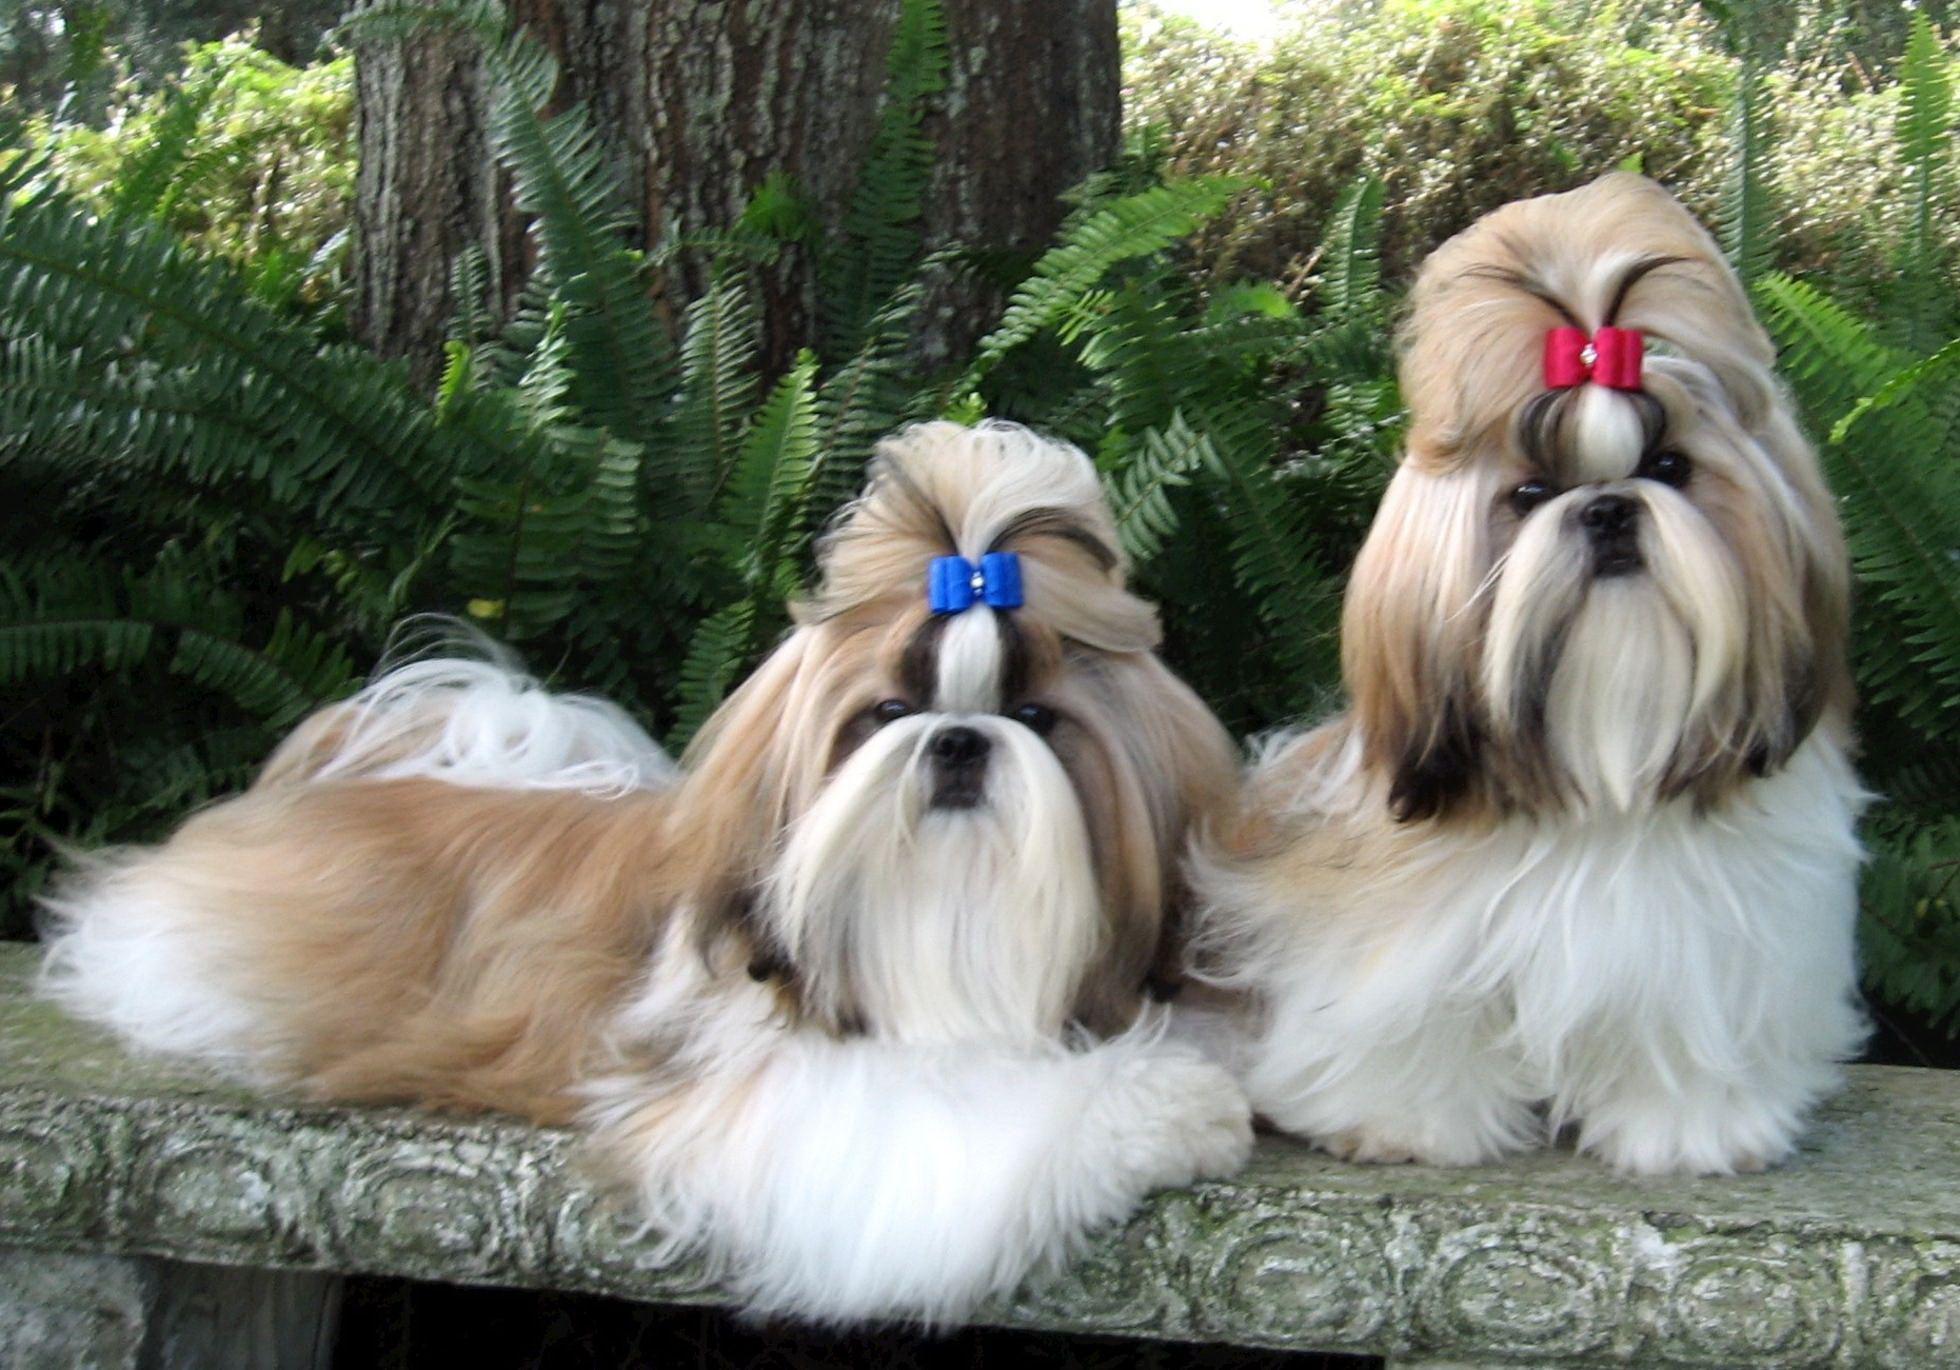 Cute Puppies Cute Shih Tzu Dogs Breed Photos Canadian Pet Care